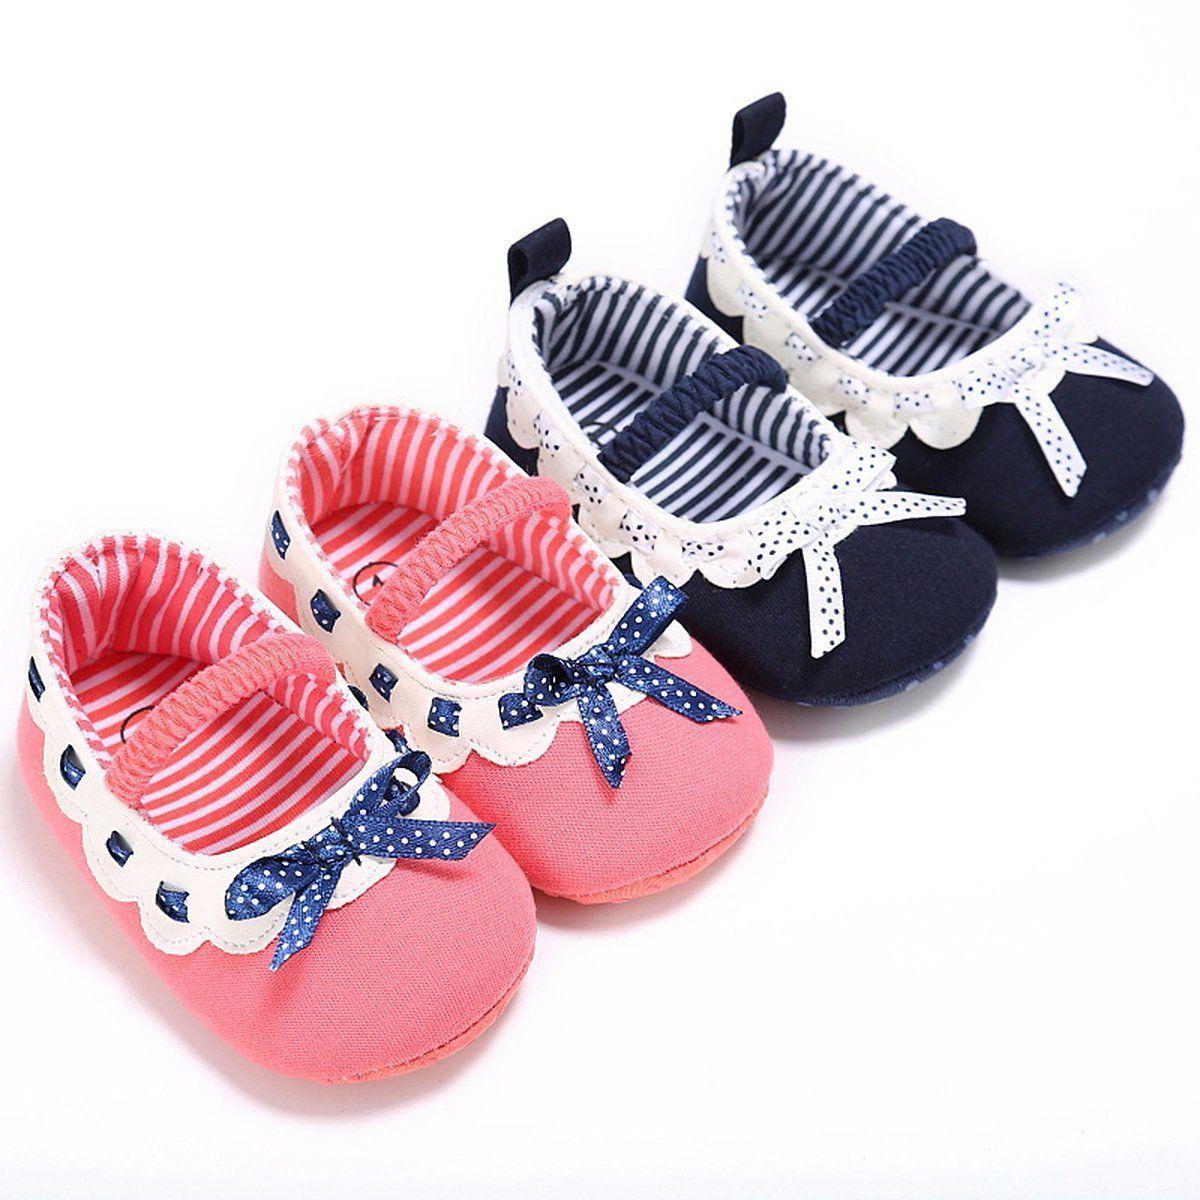 Newborn Baby Girl Princess Shoes PU Leather Soft Sole Crib Shoes Prewalker 0-12M